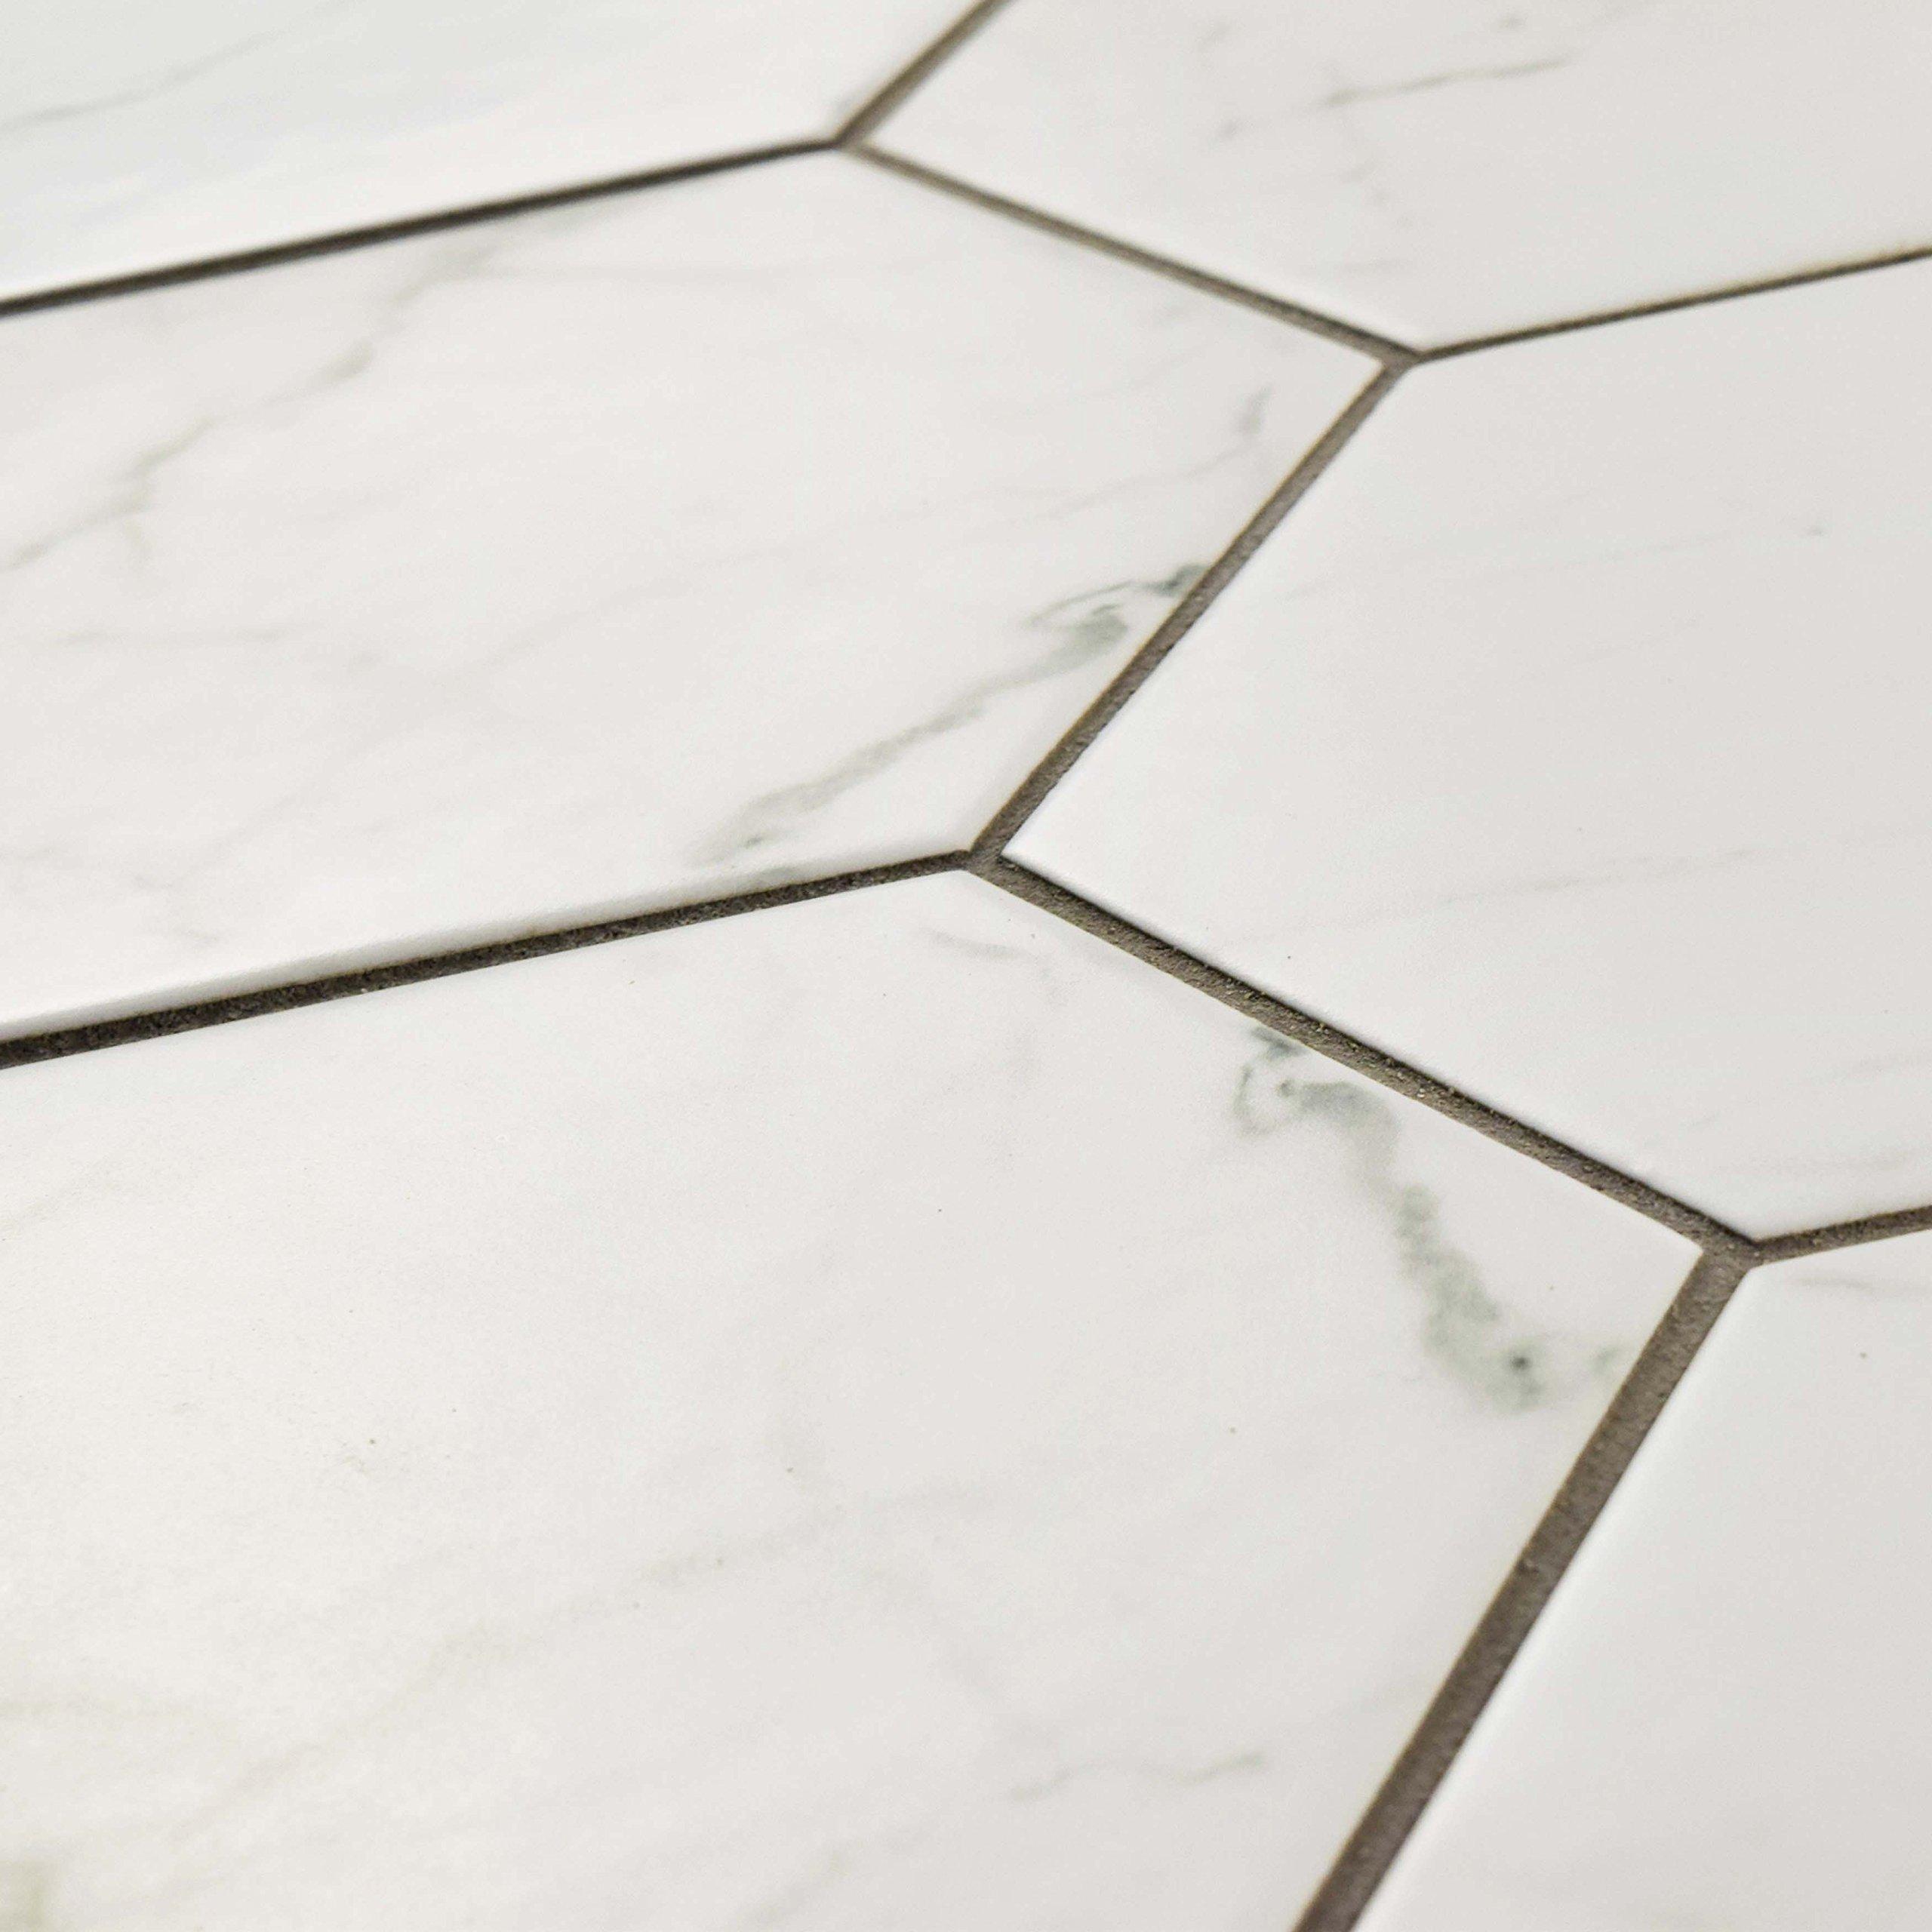 SomerTile FEQCRX Murmur Carrara Hexagon Porcelain Floor & Wall Tile, 7'' x 8'' (Pack of 25) by SOMERTILE (Image #7)